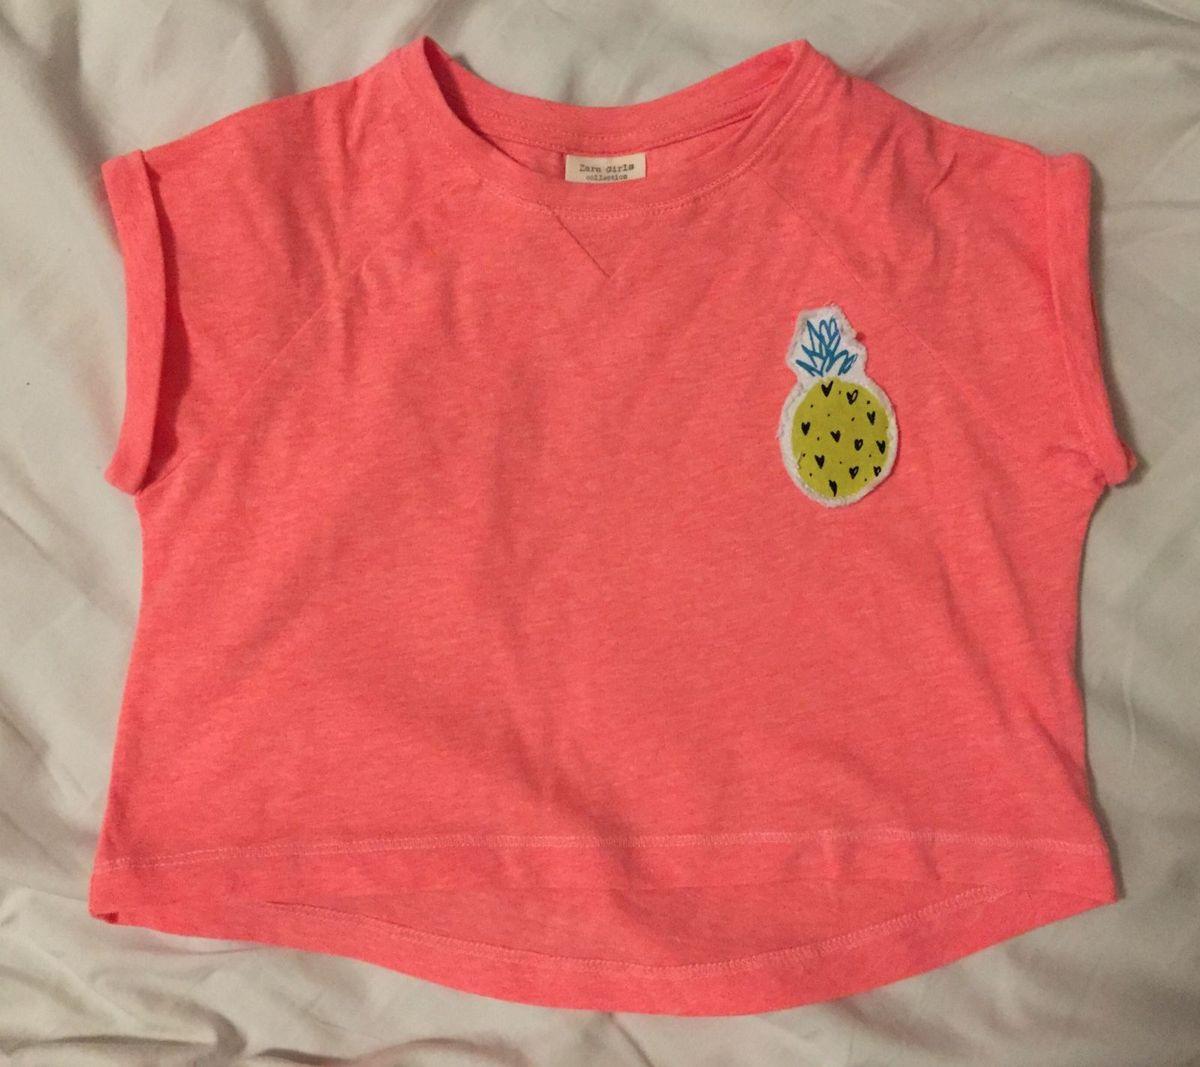 c109a579ff68 Blusa Cropped Infantil Rosa-neon Zara Tam 4 | Roupa Infantil para ...